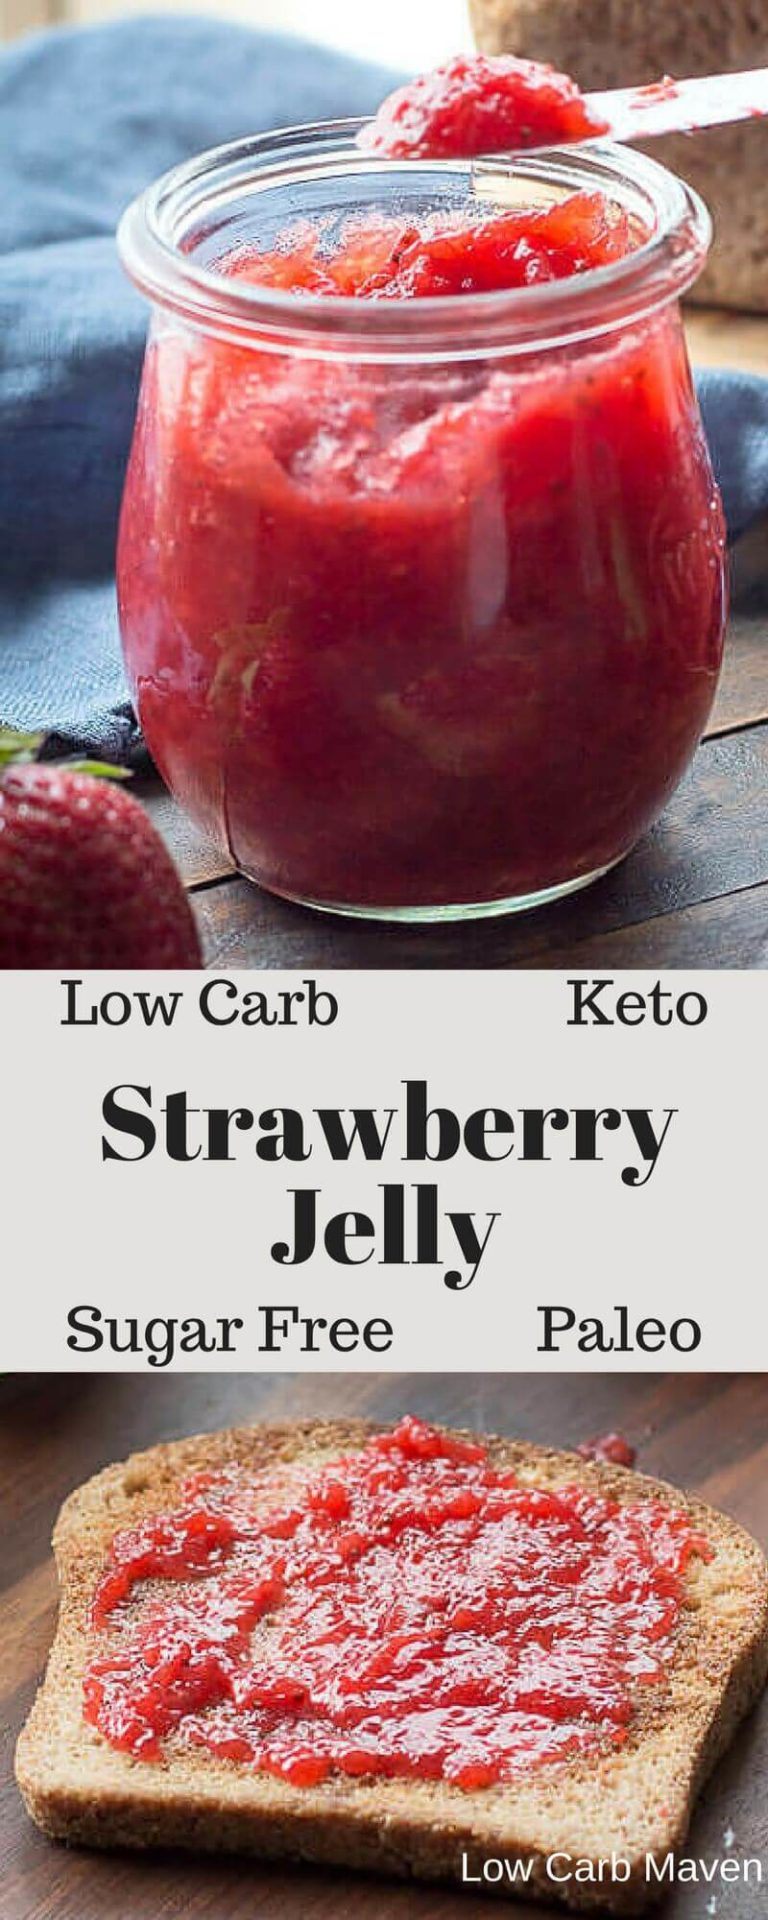 Sugar-Free Strawberry Jam (low carb, keto)